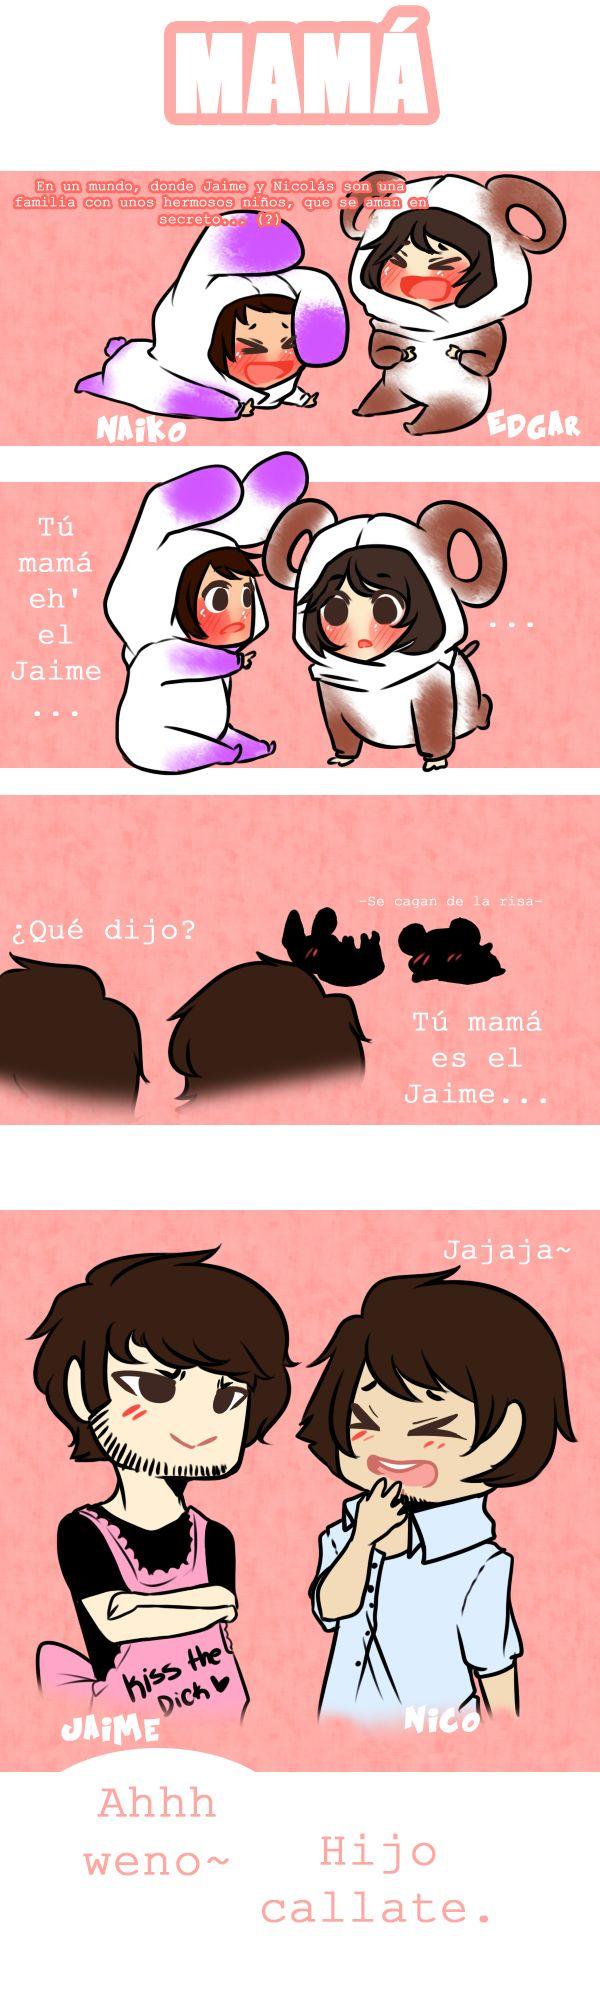 Tu mamá es el Jaime - #Jainico #Ednaiko [Jaidefinichon GOTH] |  by Once-Upon-A-Cherry